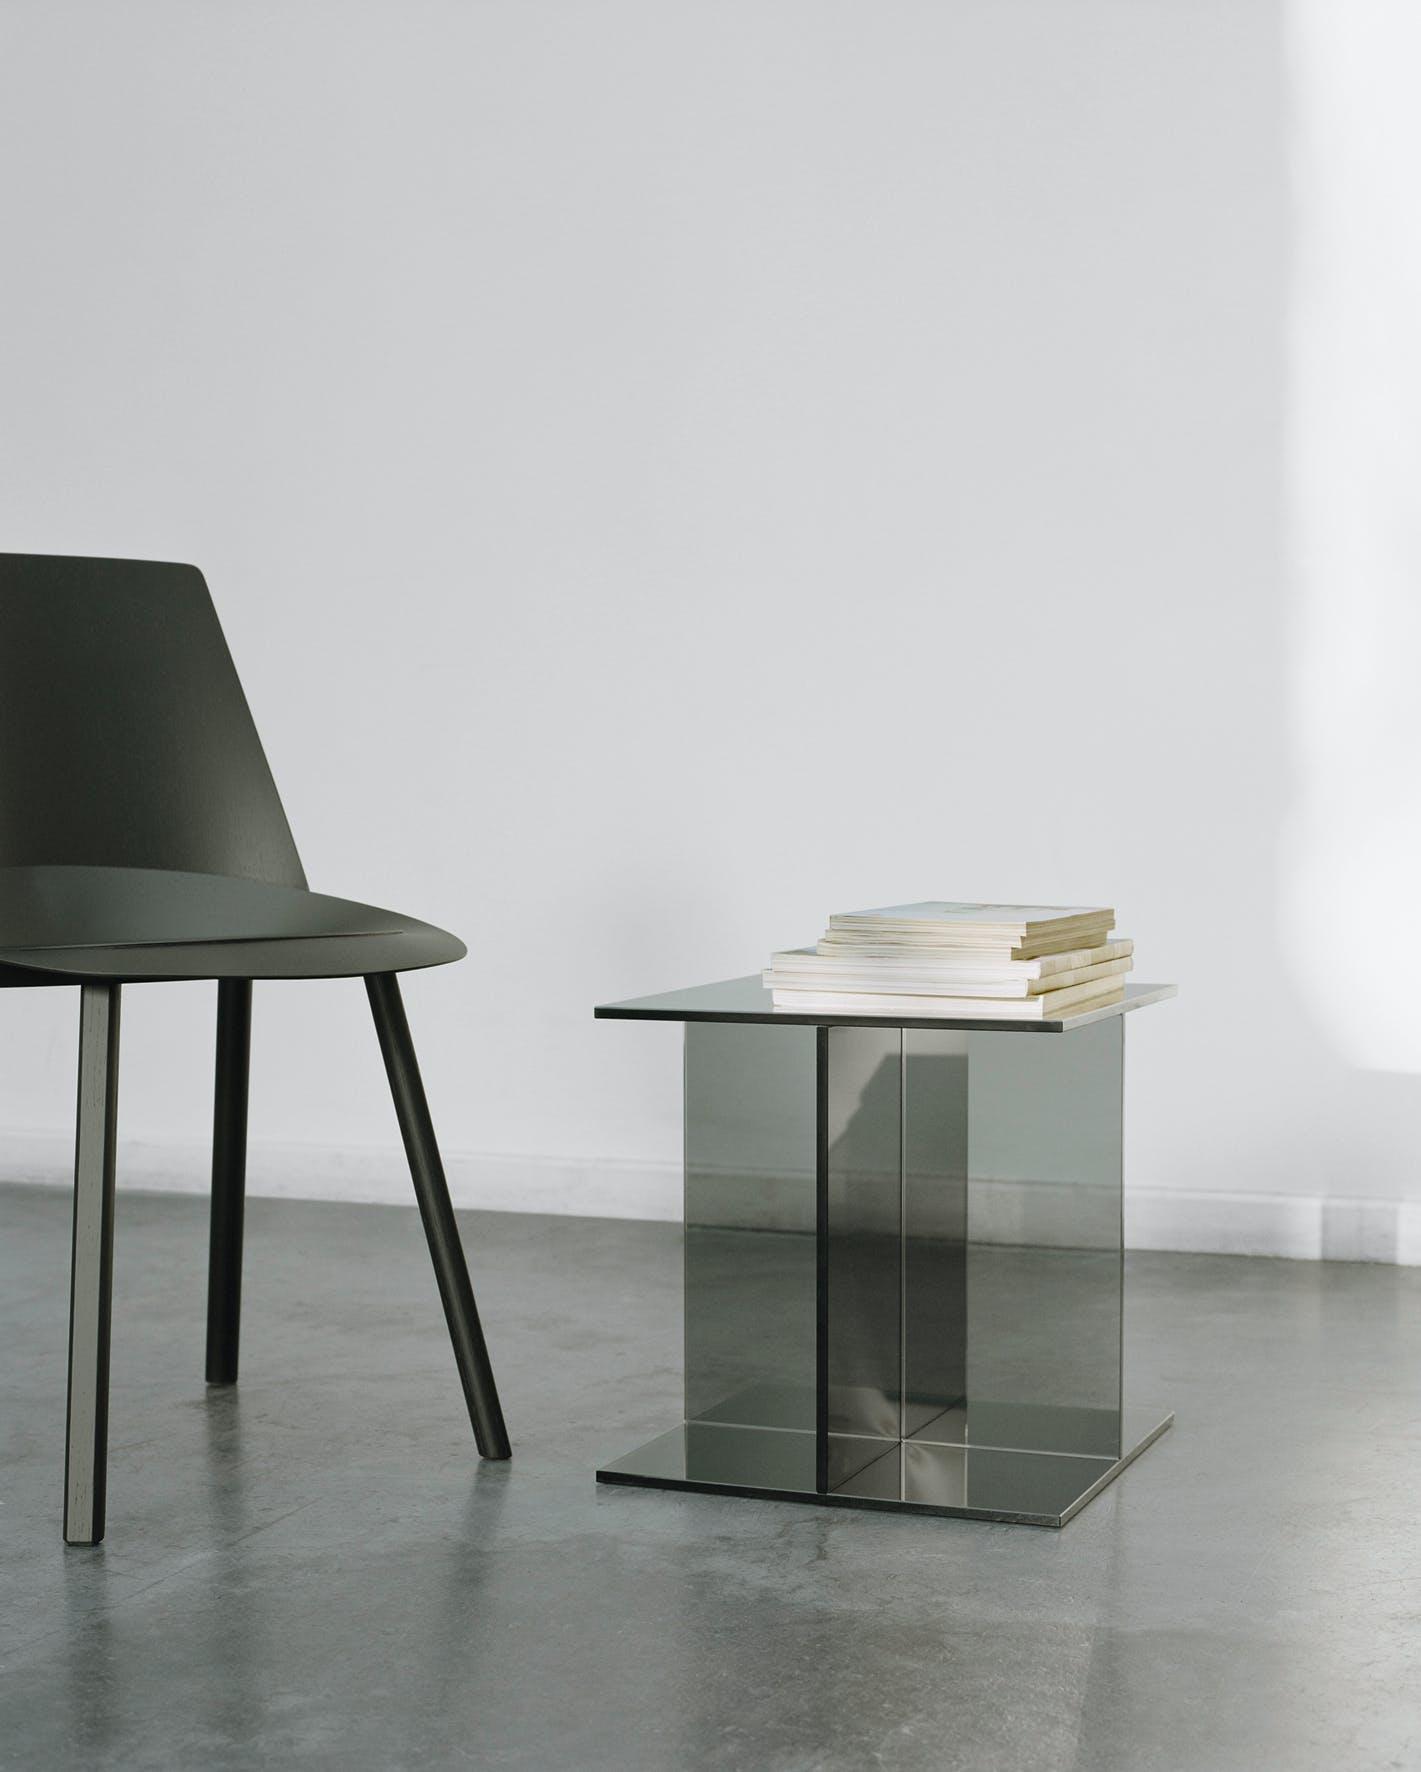 E15-furniture-vier-side-table-black-chair-haute-living